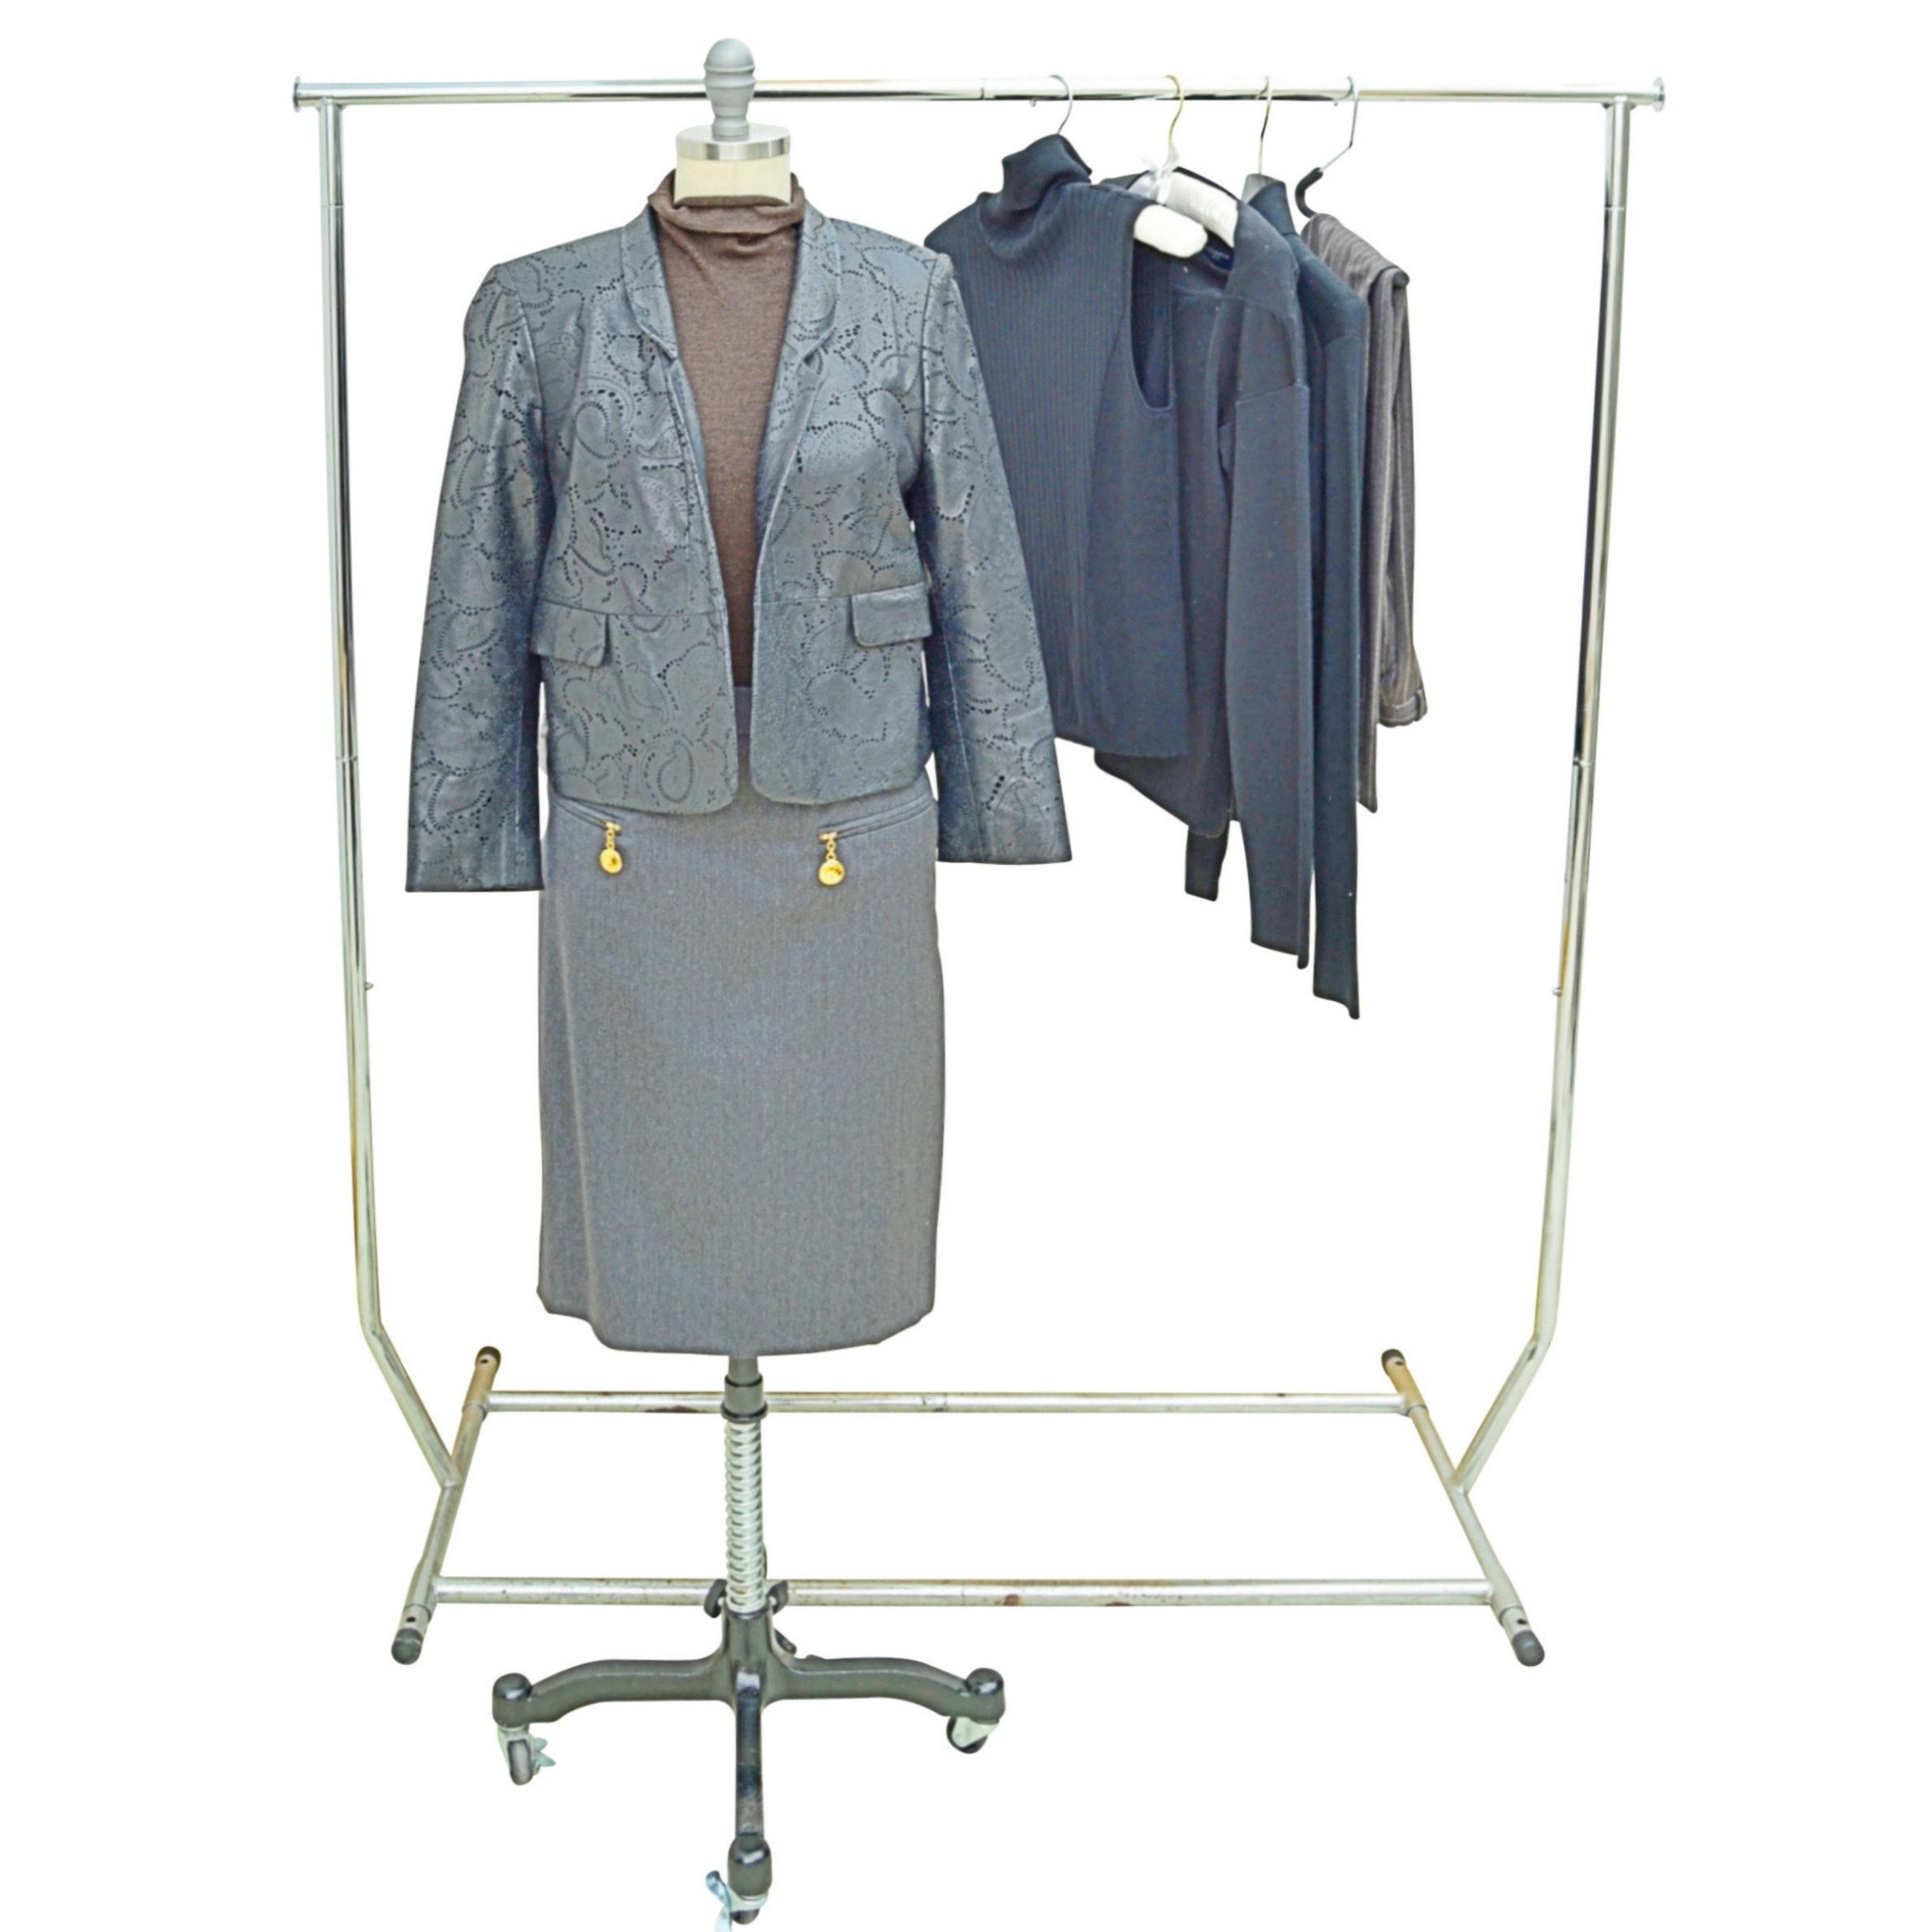 Women's Separates with Leather Jacket, Akris Punto, Piazza Sempione, Valentino